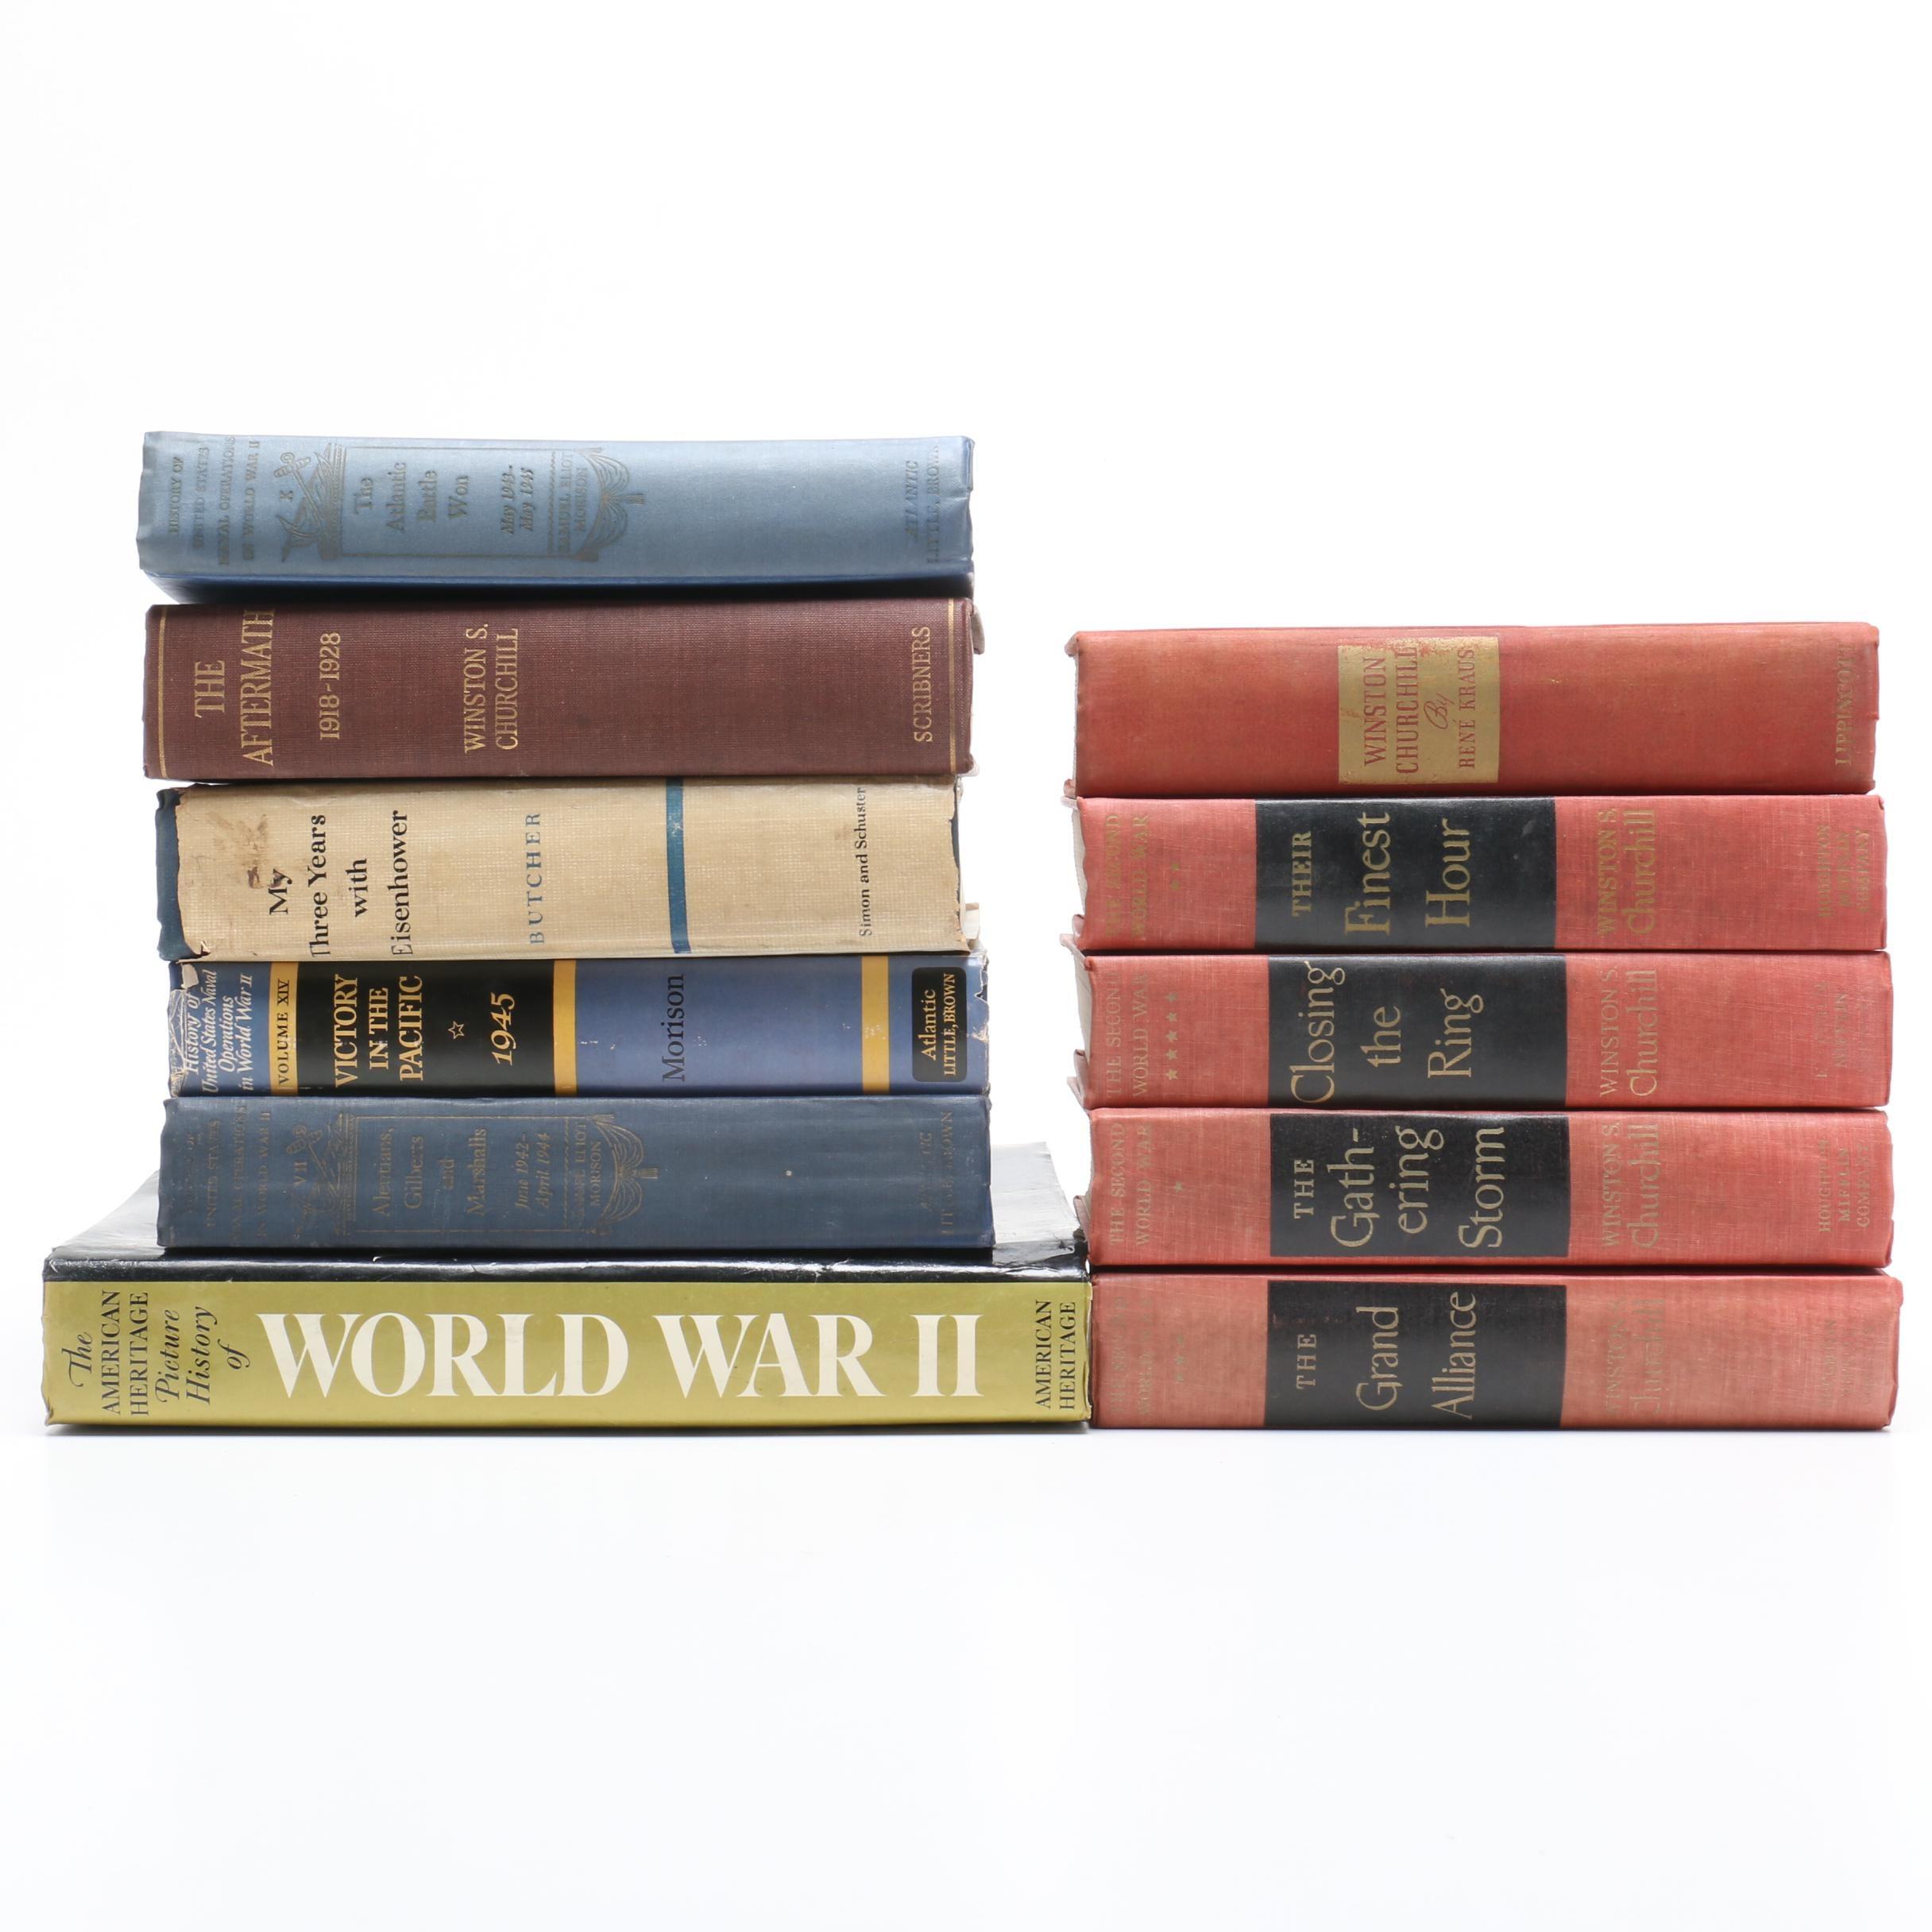 World War II Books featuring Naval Operations, Churchill and Eisenhower